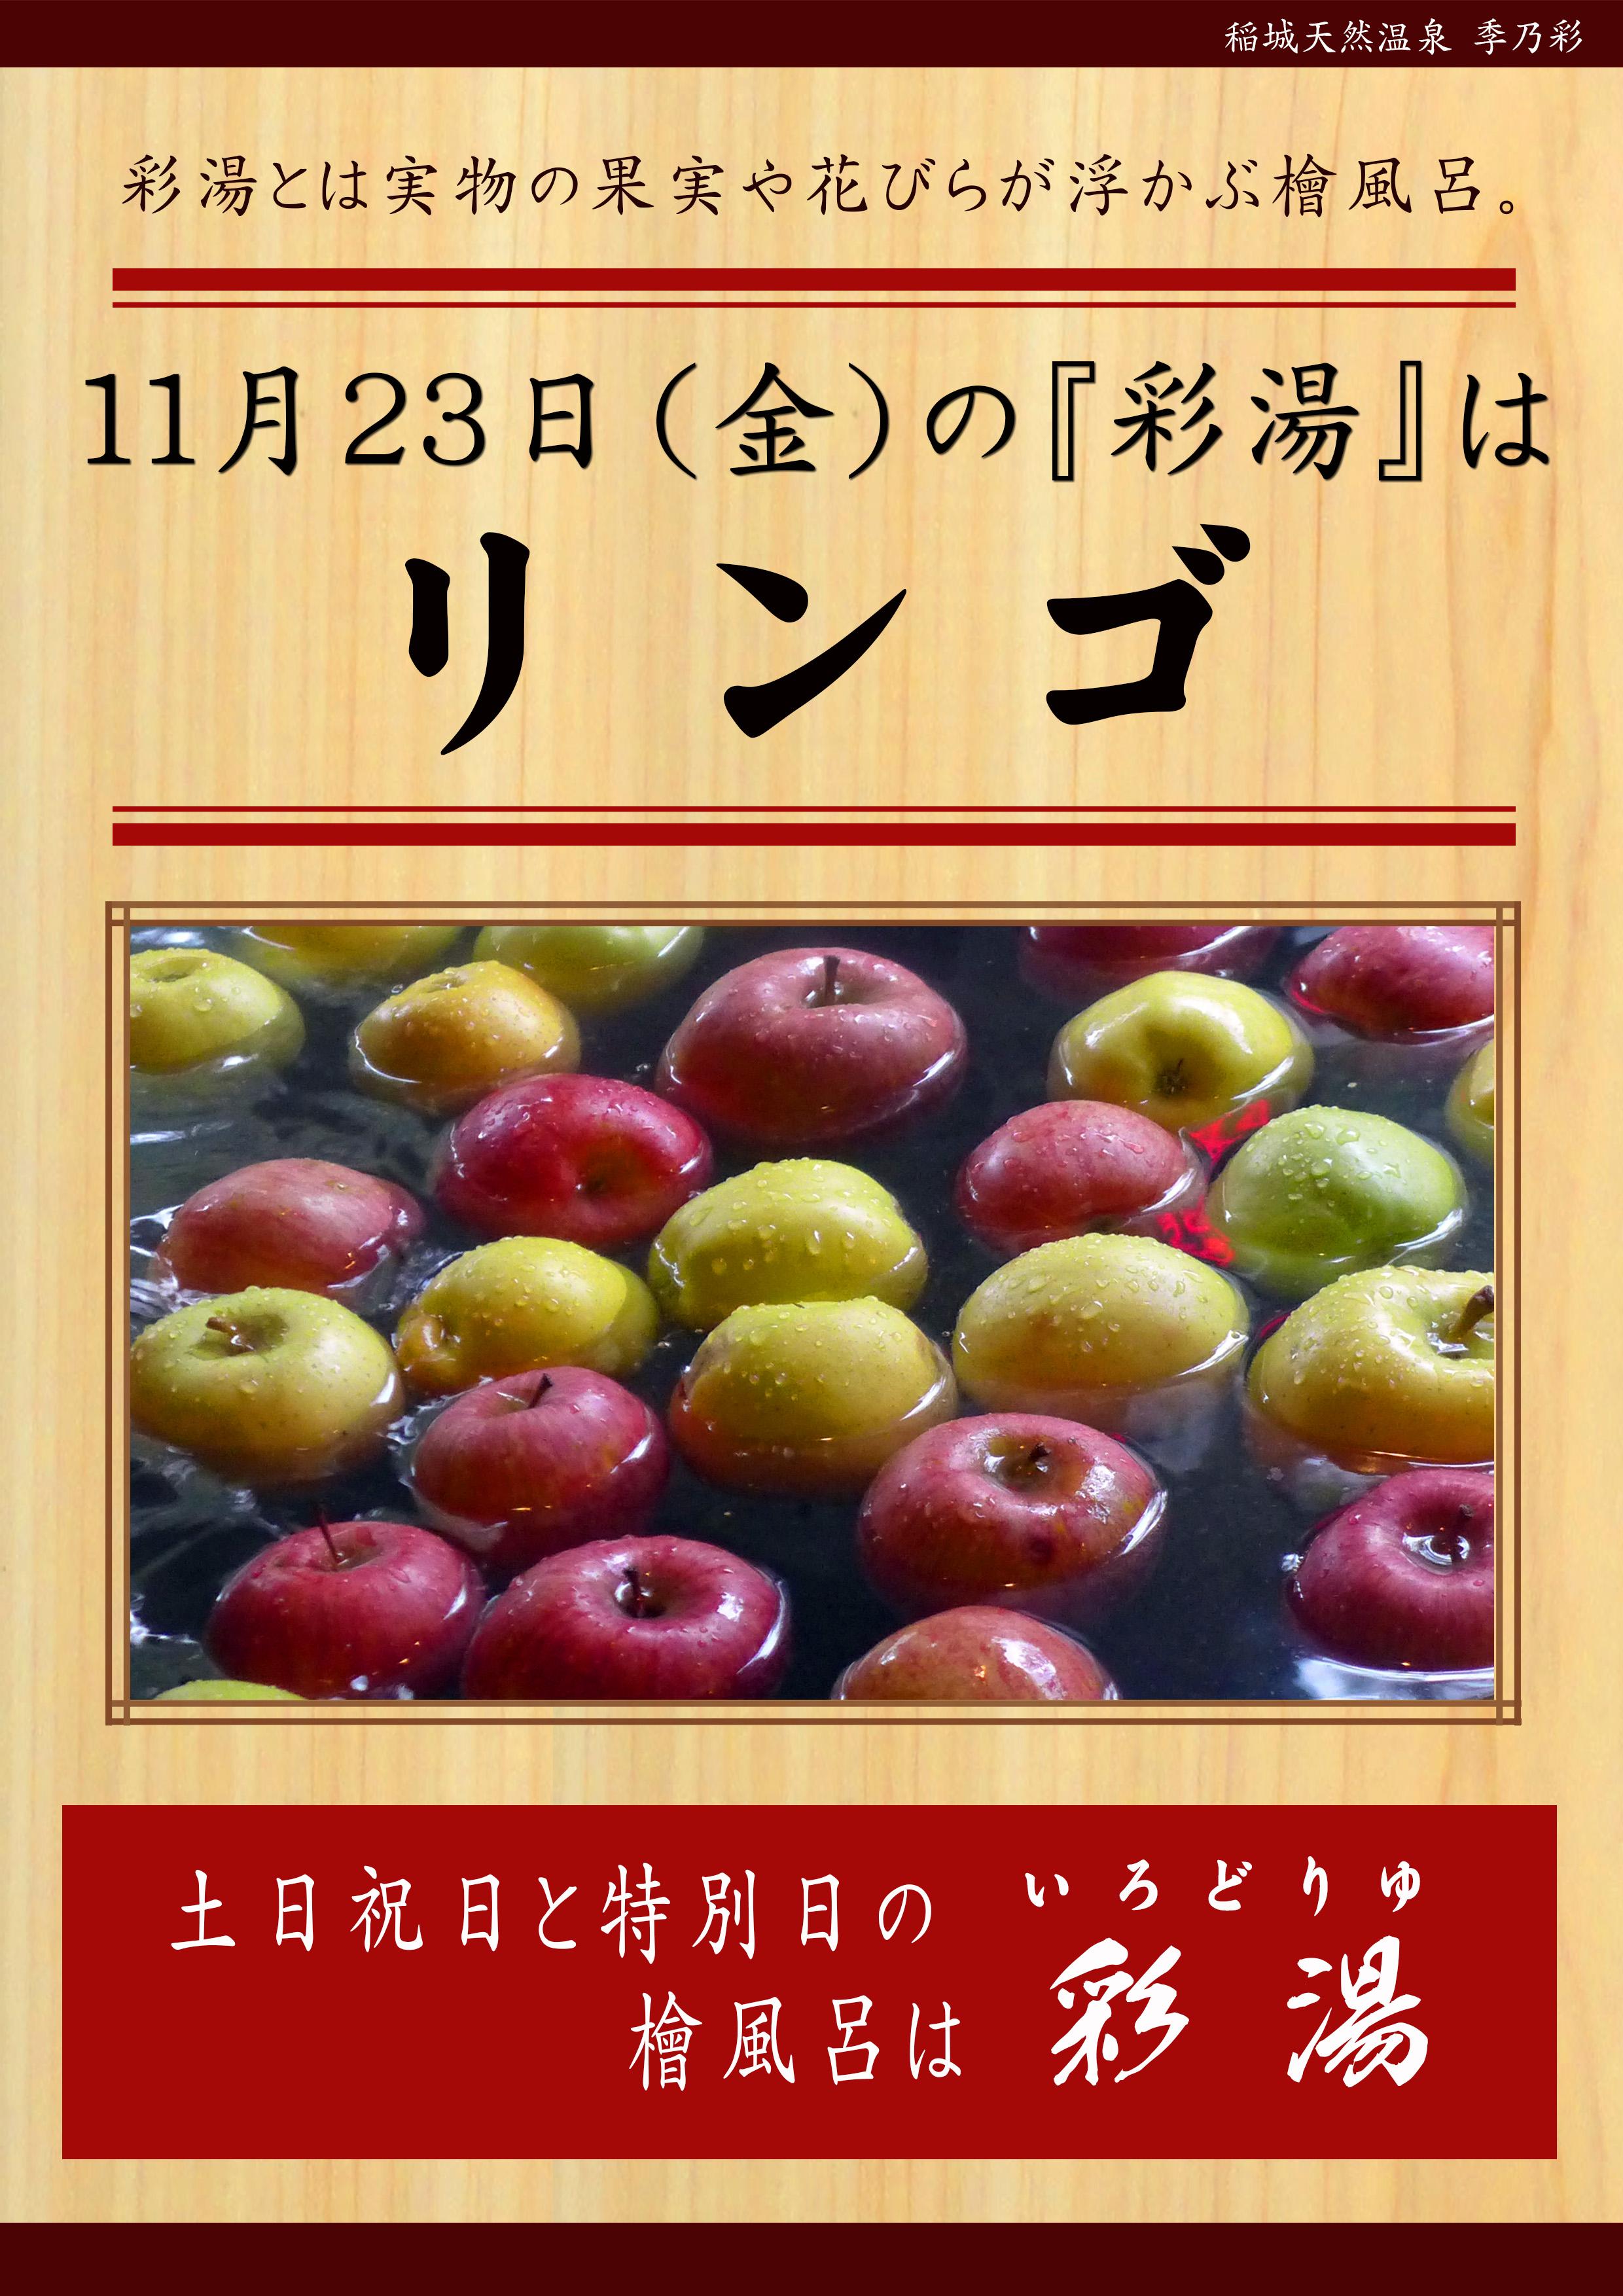 20181123POP イベント 彩湯 リンゴ(赤と黄)